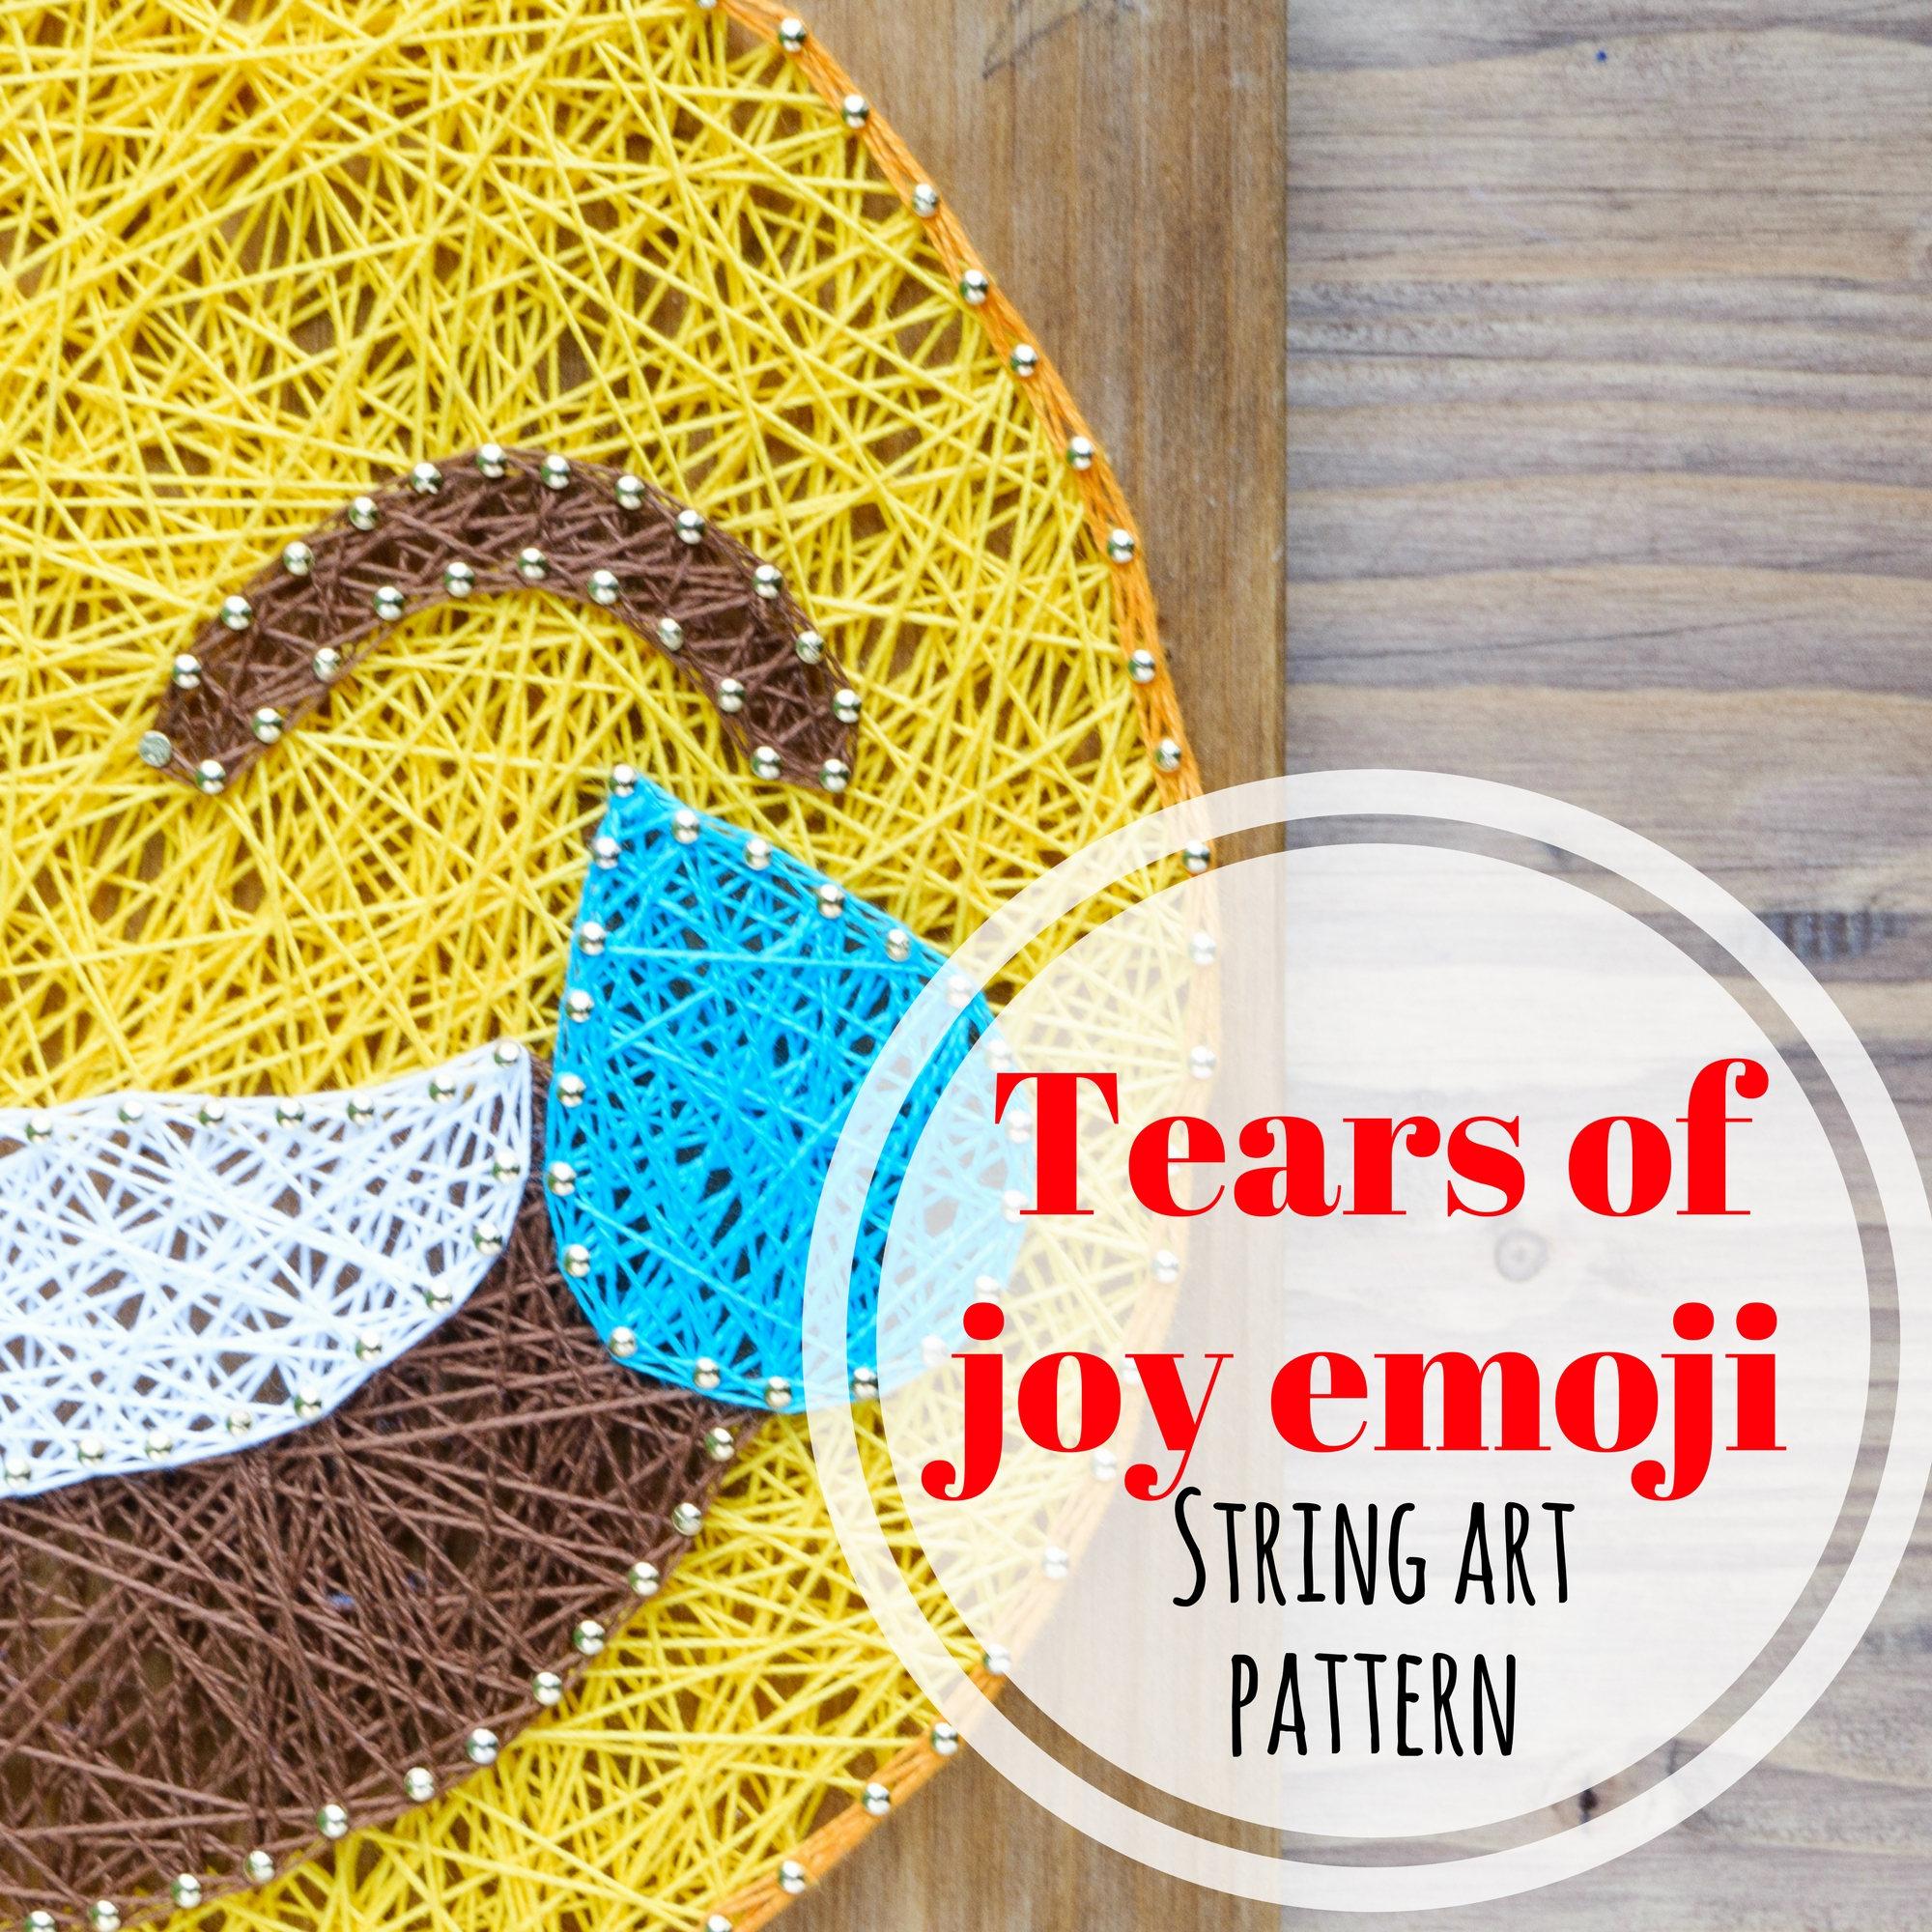 Tears of Joy emoji string art template pattern DIY string